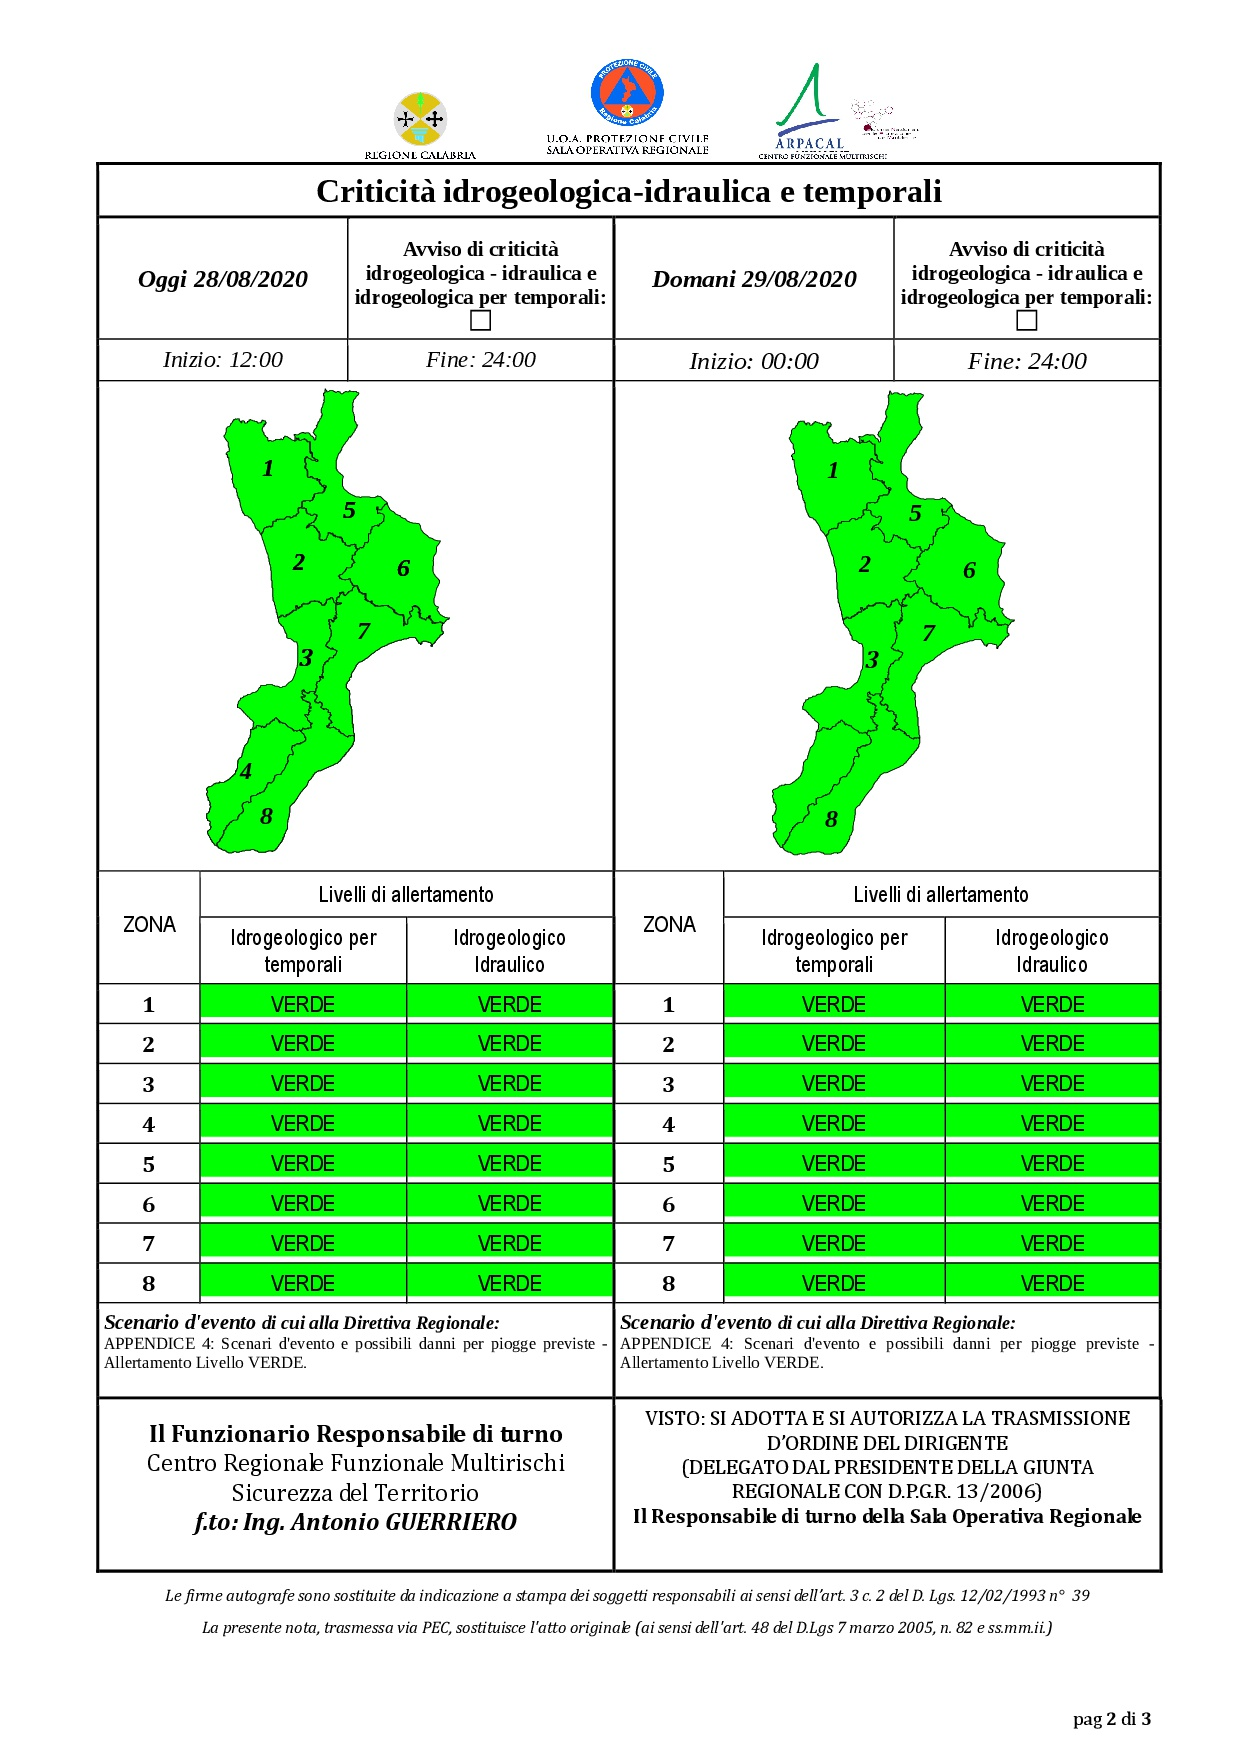 Criticità idrogeologica-idraulica e temporali in Calabria 28-08-2020